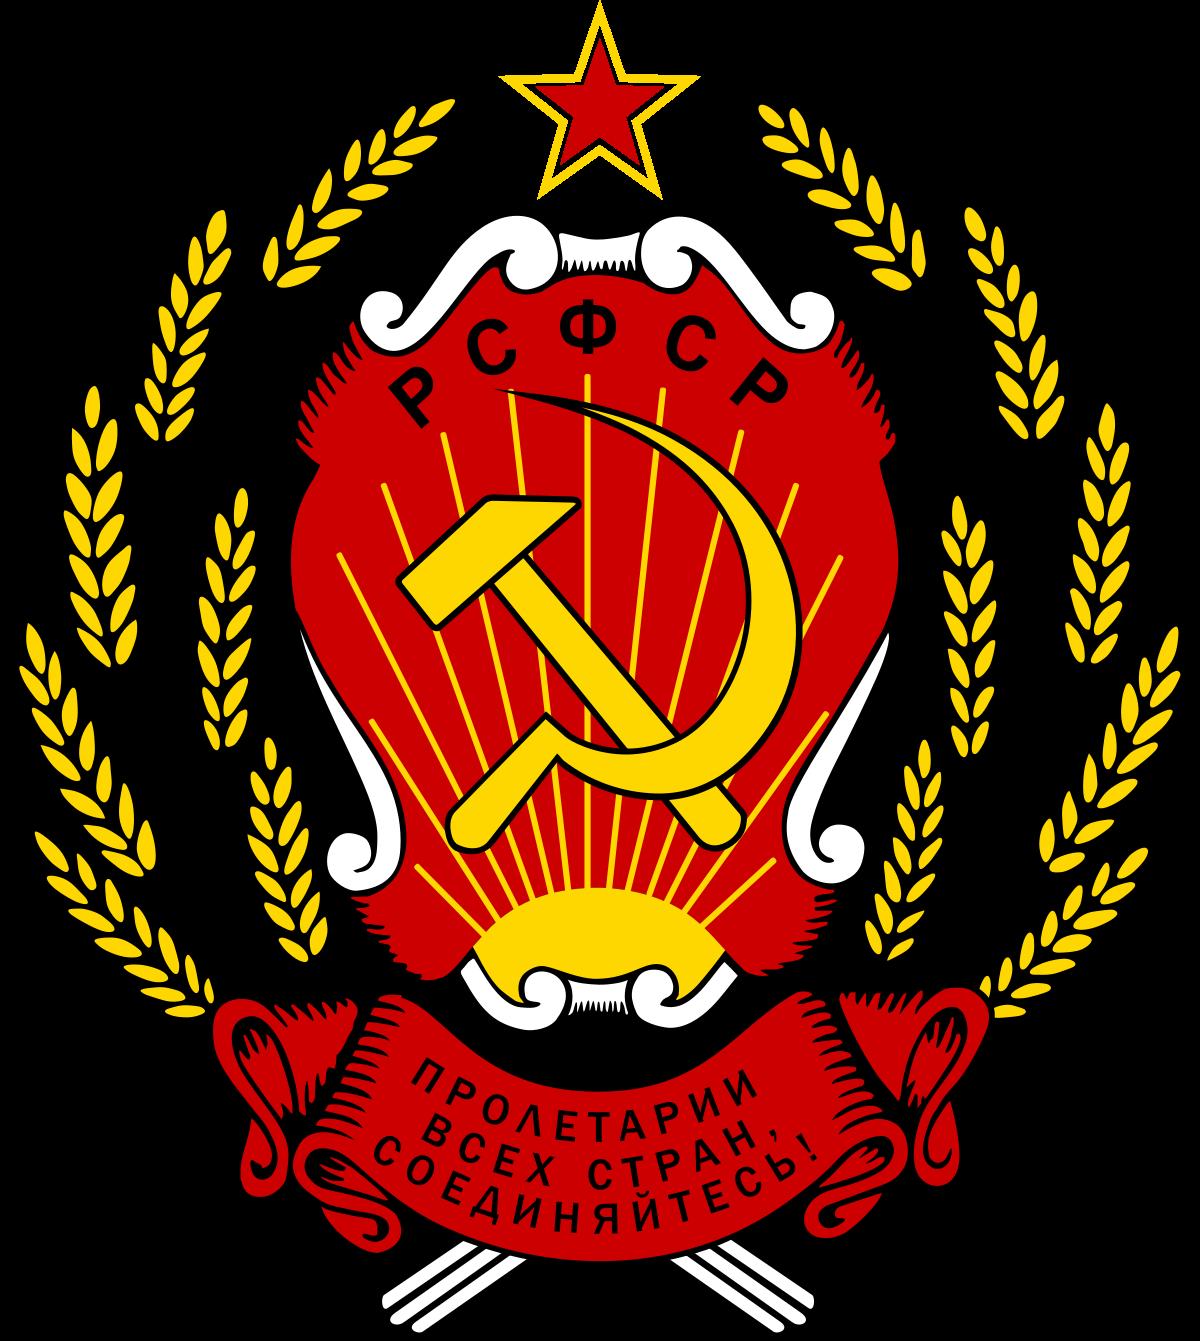 Emblem of the Russian Soviet Federative Socialist Republic.